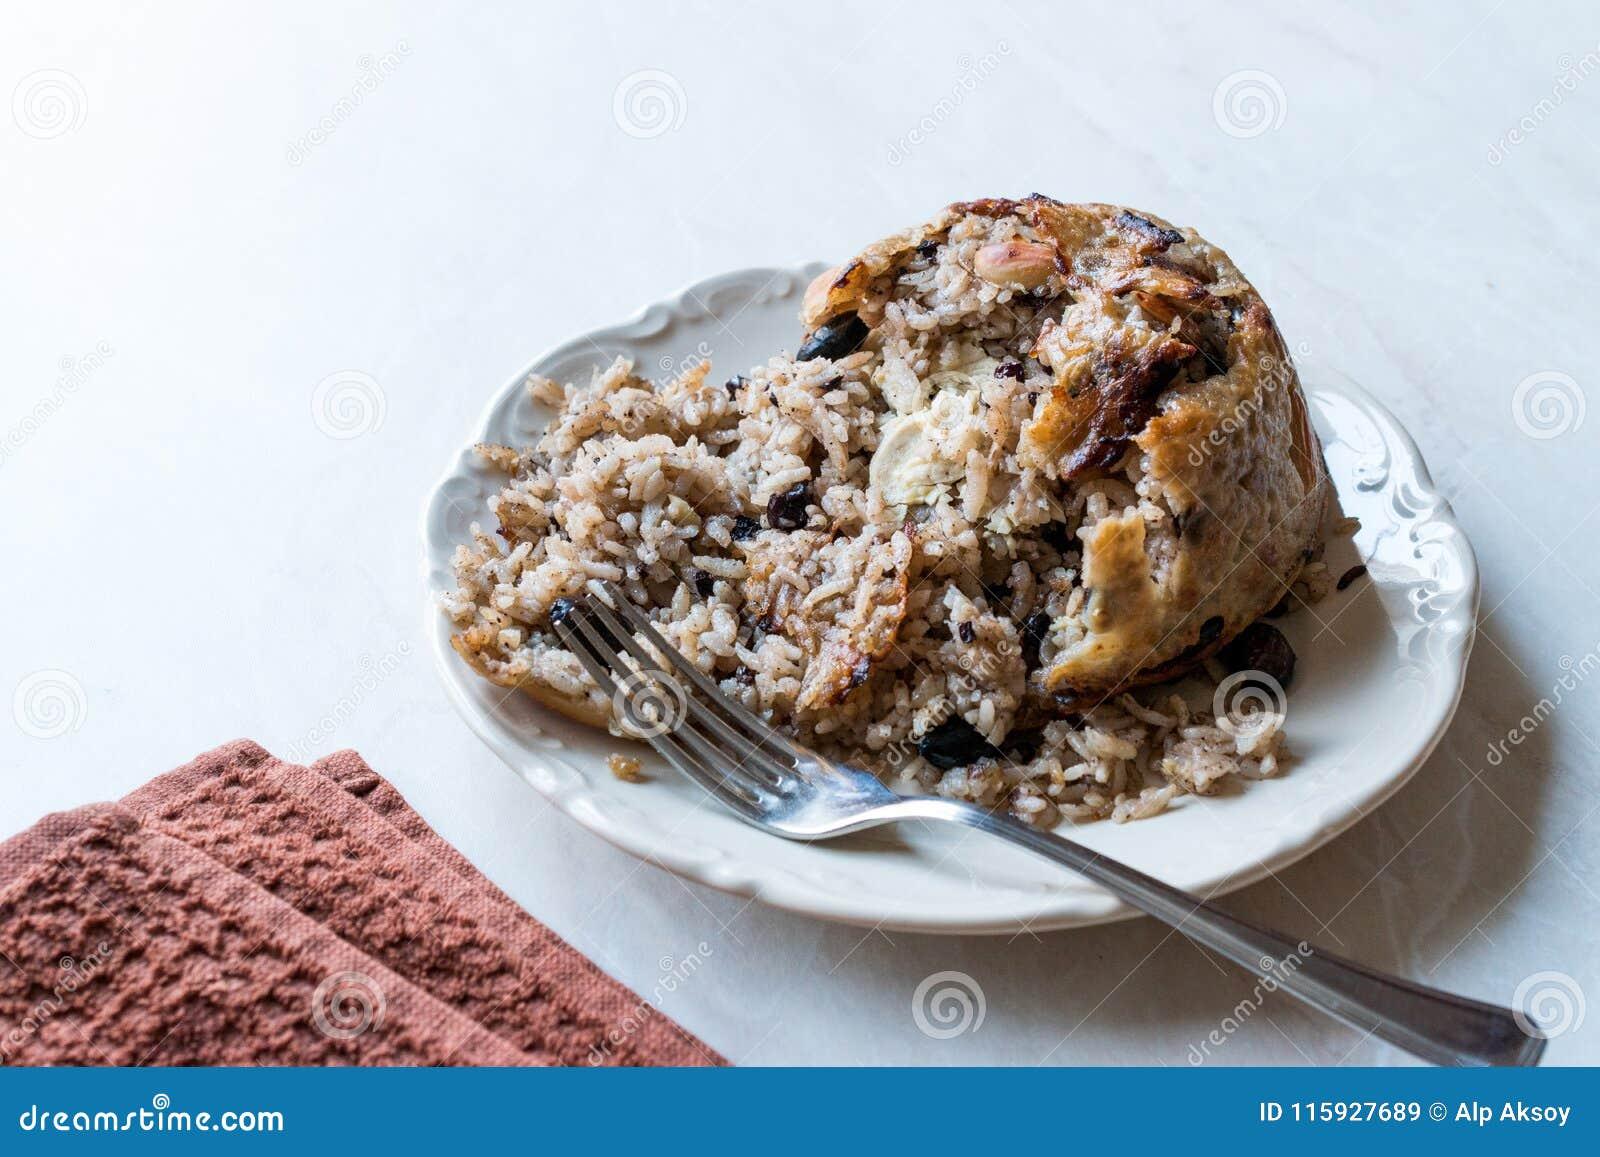 avi瑟瑟图_土耳其语perde pilavi/装饰与鸡,杏仁和葡萄干/pilav的肉饭.